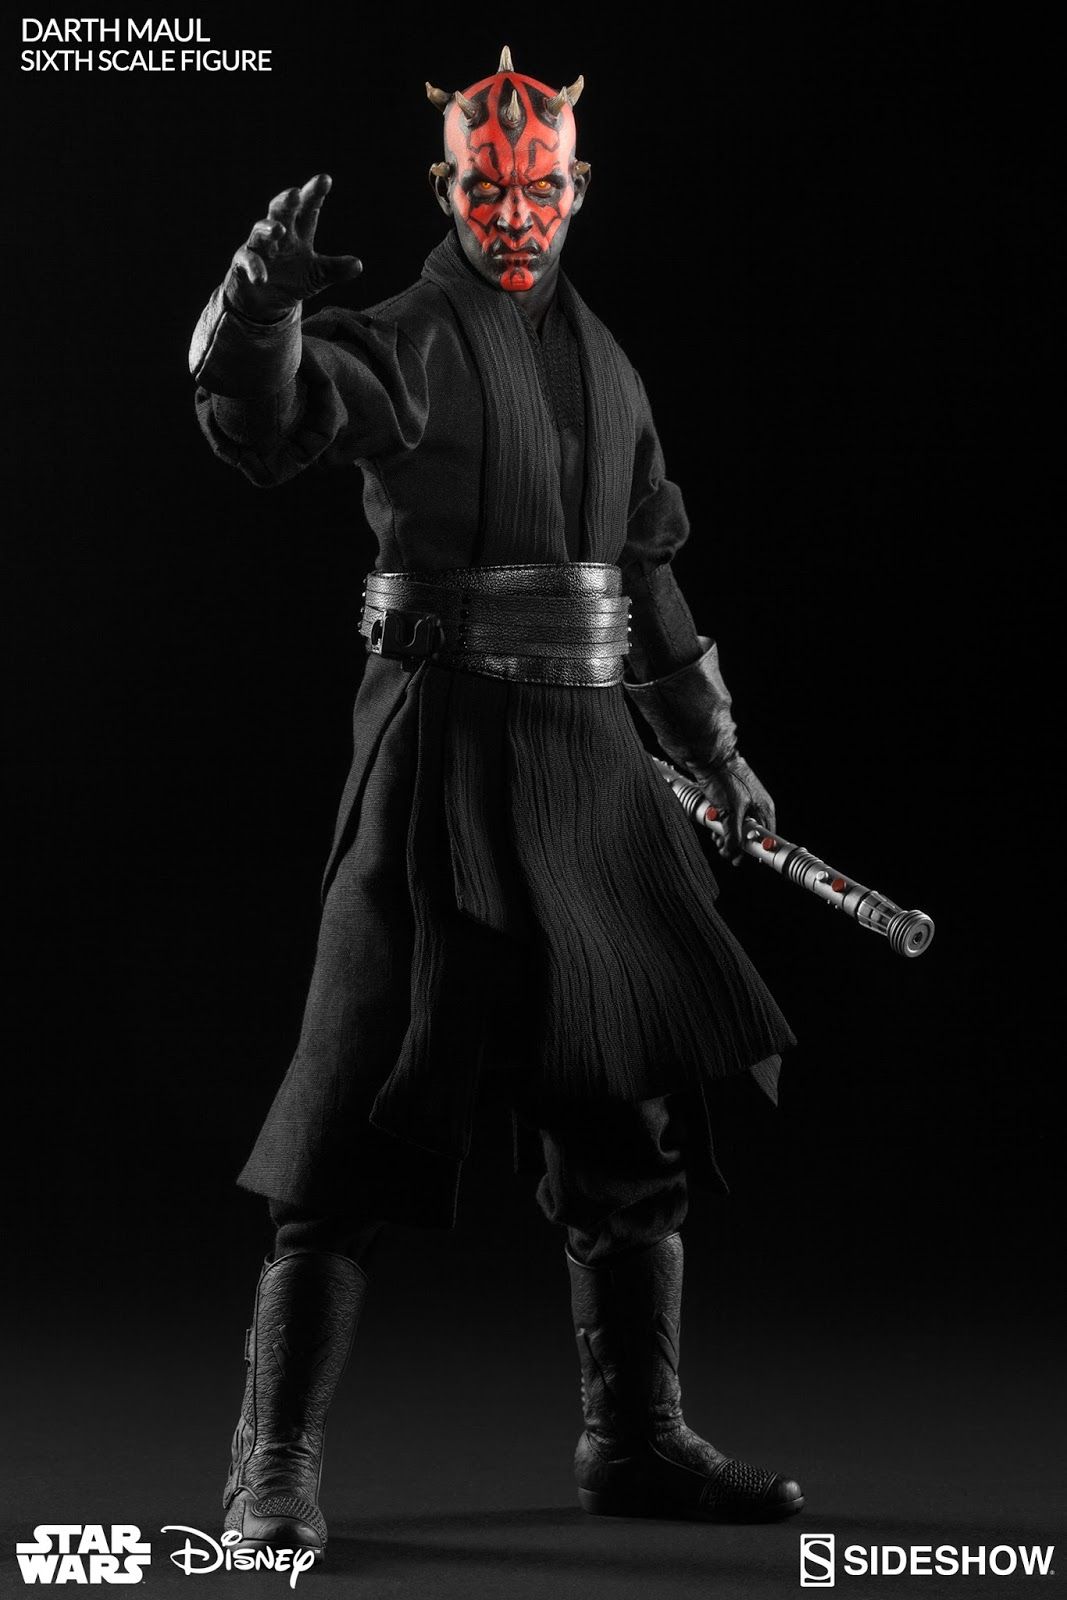 Star Wars Darth Maul (Duel on Naboo) 1/6 Scale Figure